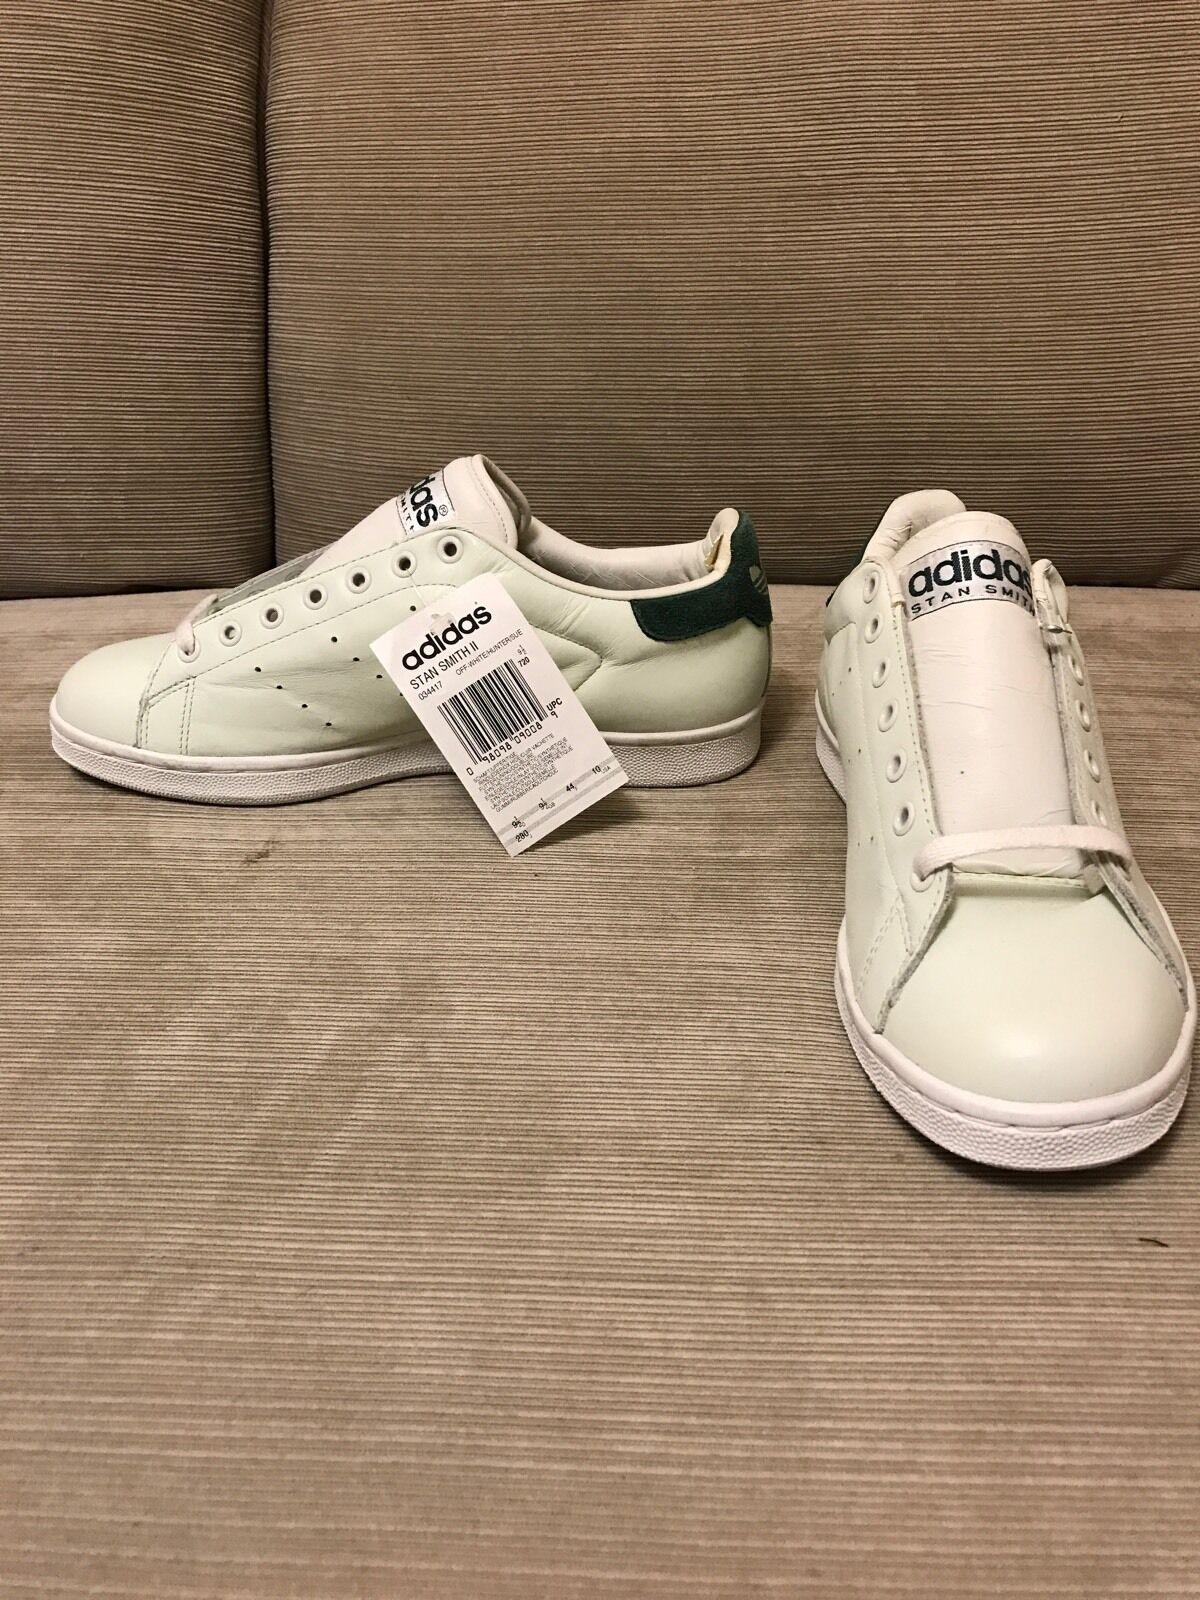 Rare Adidas Stan Smith Vintage, White/Gray And Green  Comfortable